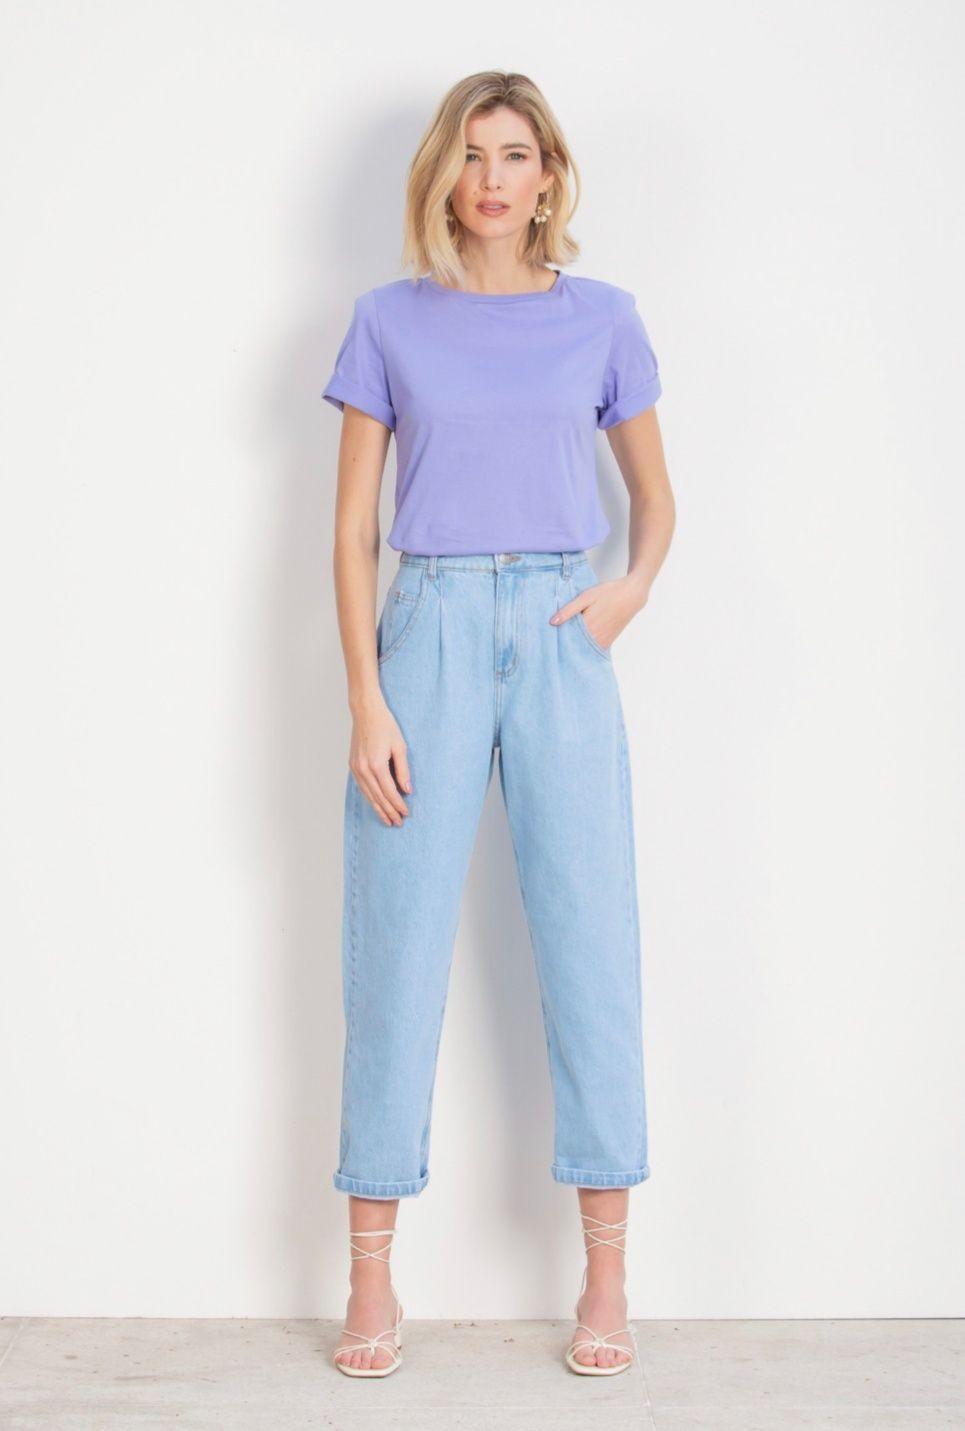 Calça Silvia Slouchy jeans claro